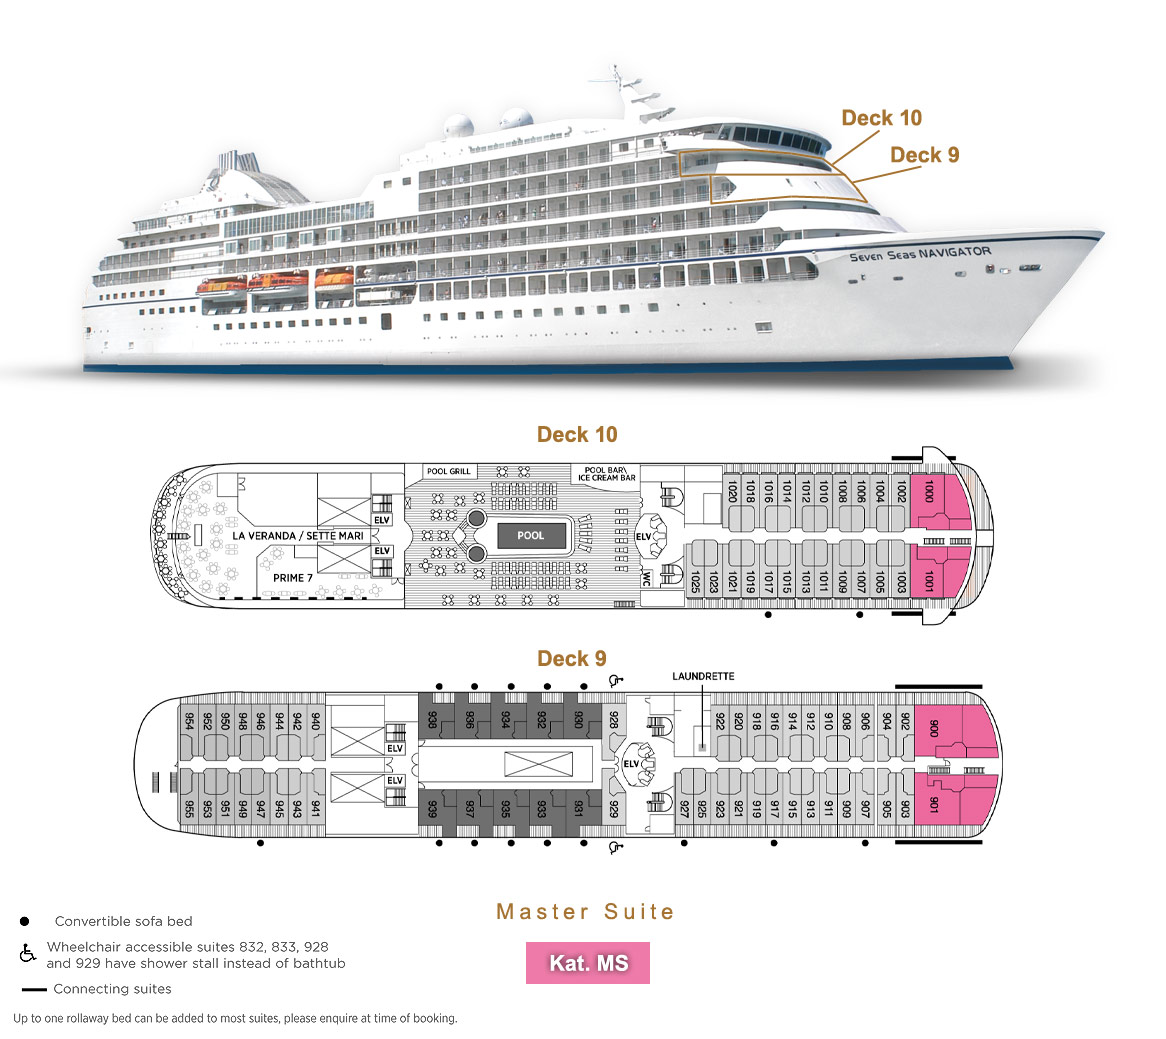 Master Suite MS - Seven Seas Navigator - Bild 7 - Lage Thumb